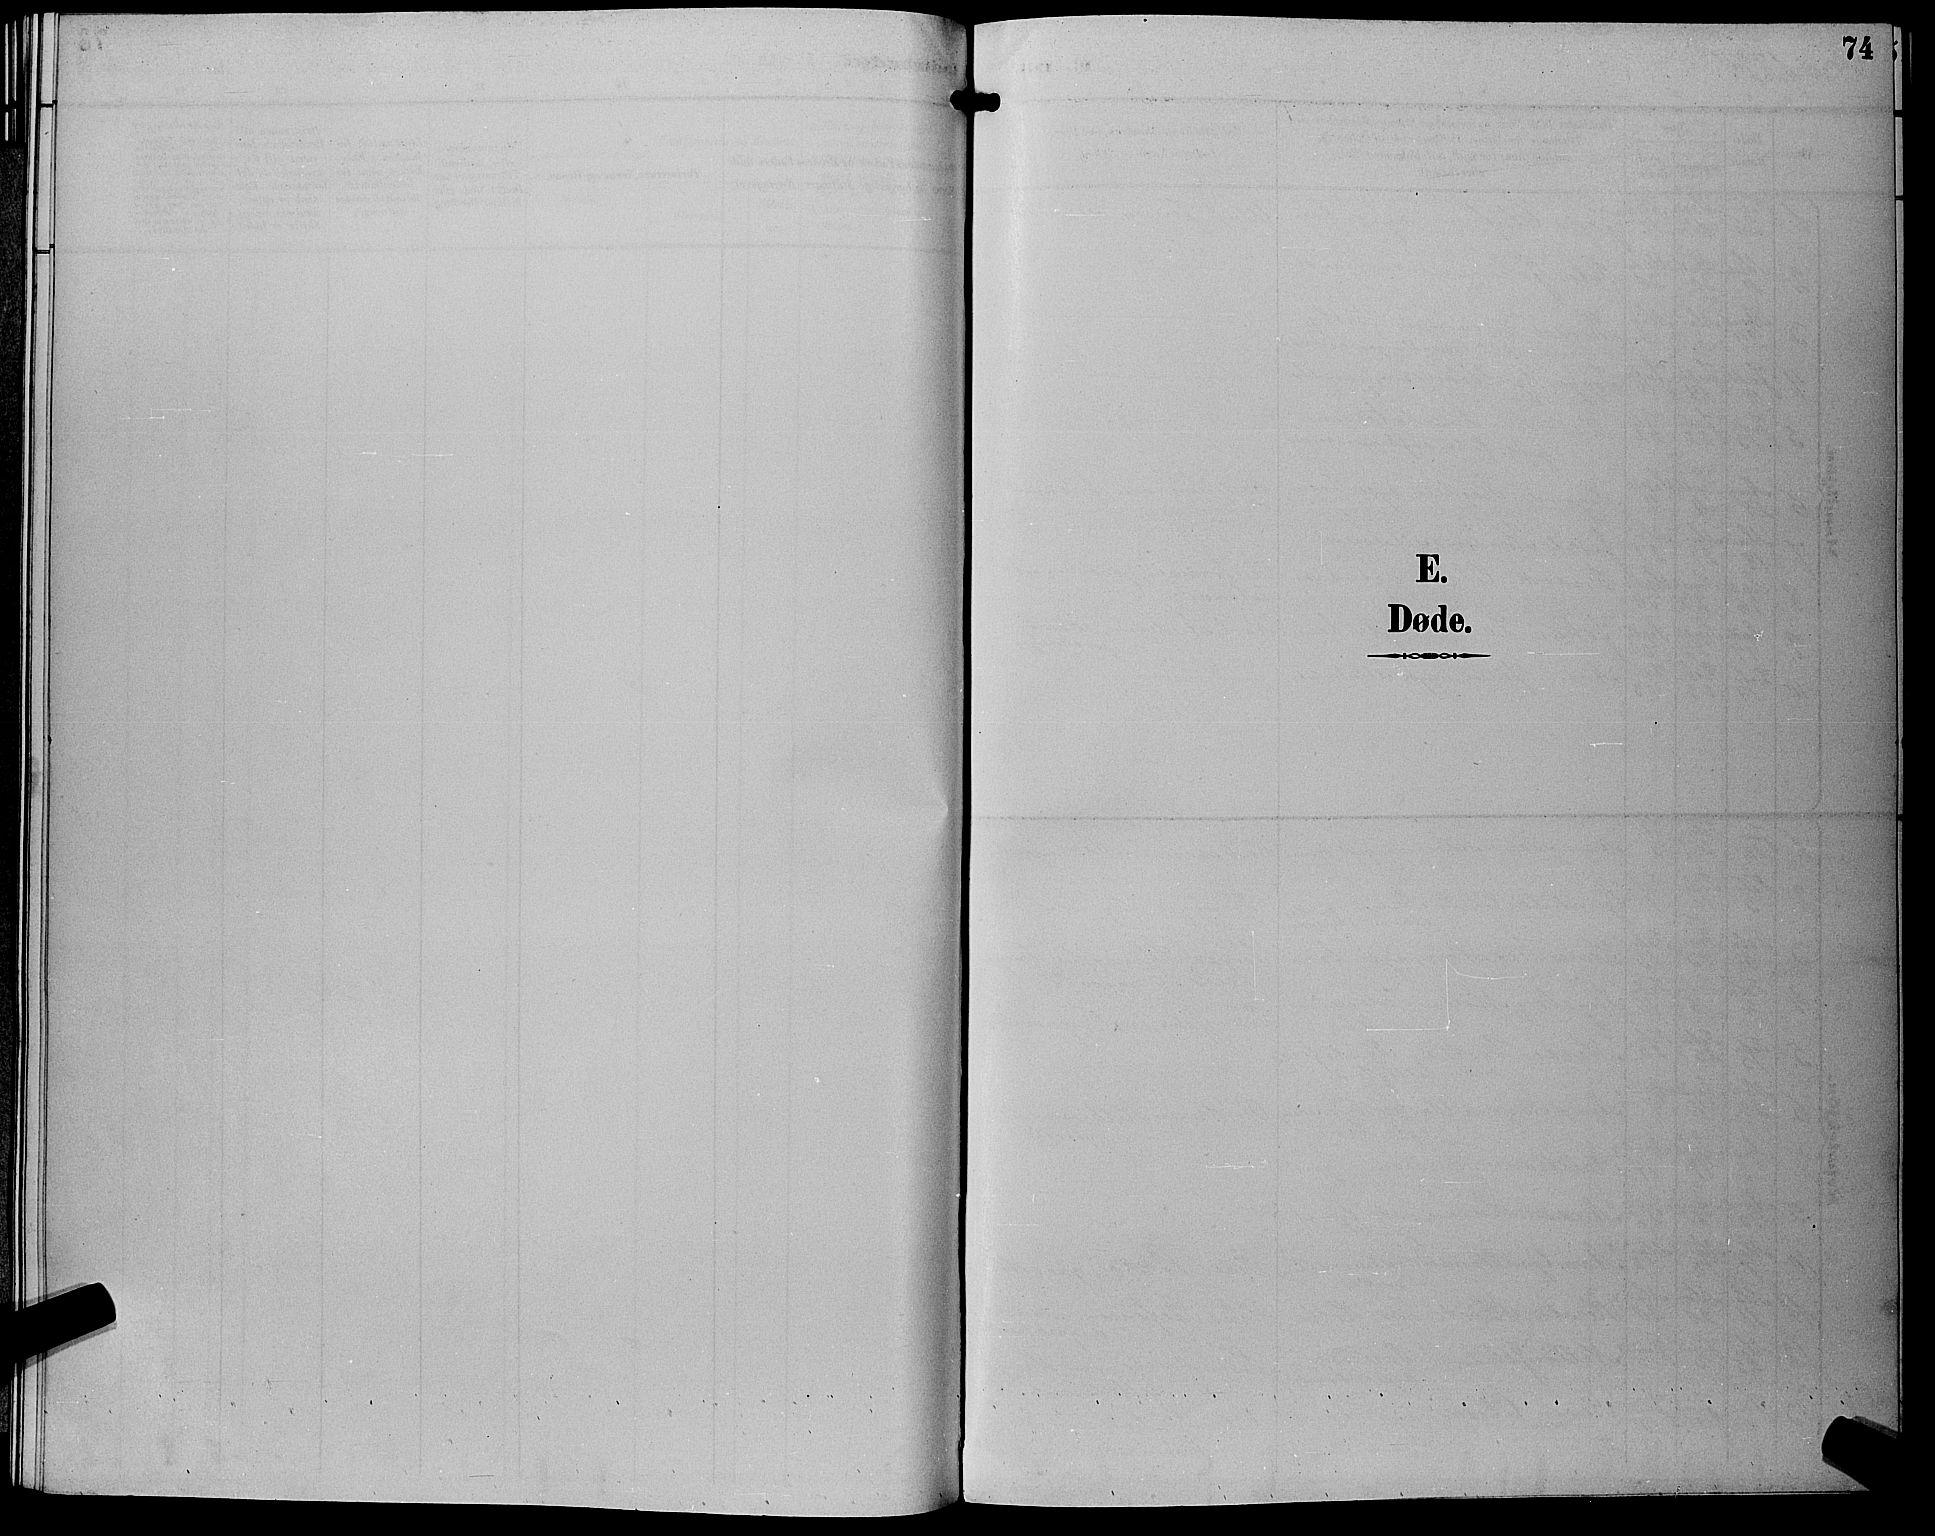 SAKO, Eiker kirkebøker, G/Gb/L0004: Klokkerbok nr. II 4, 1894-1900, s. 74